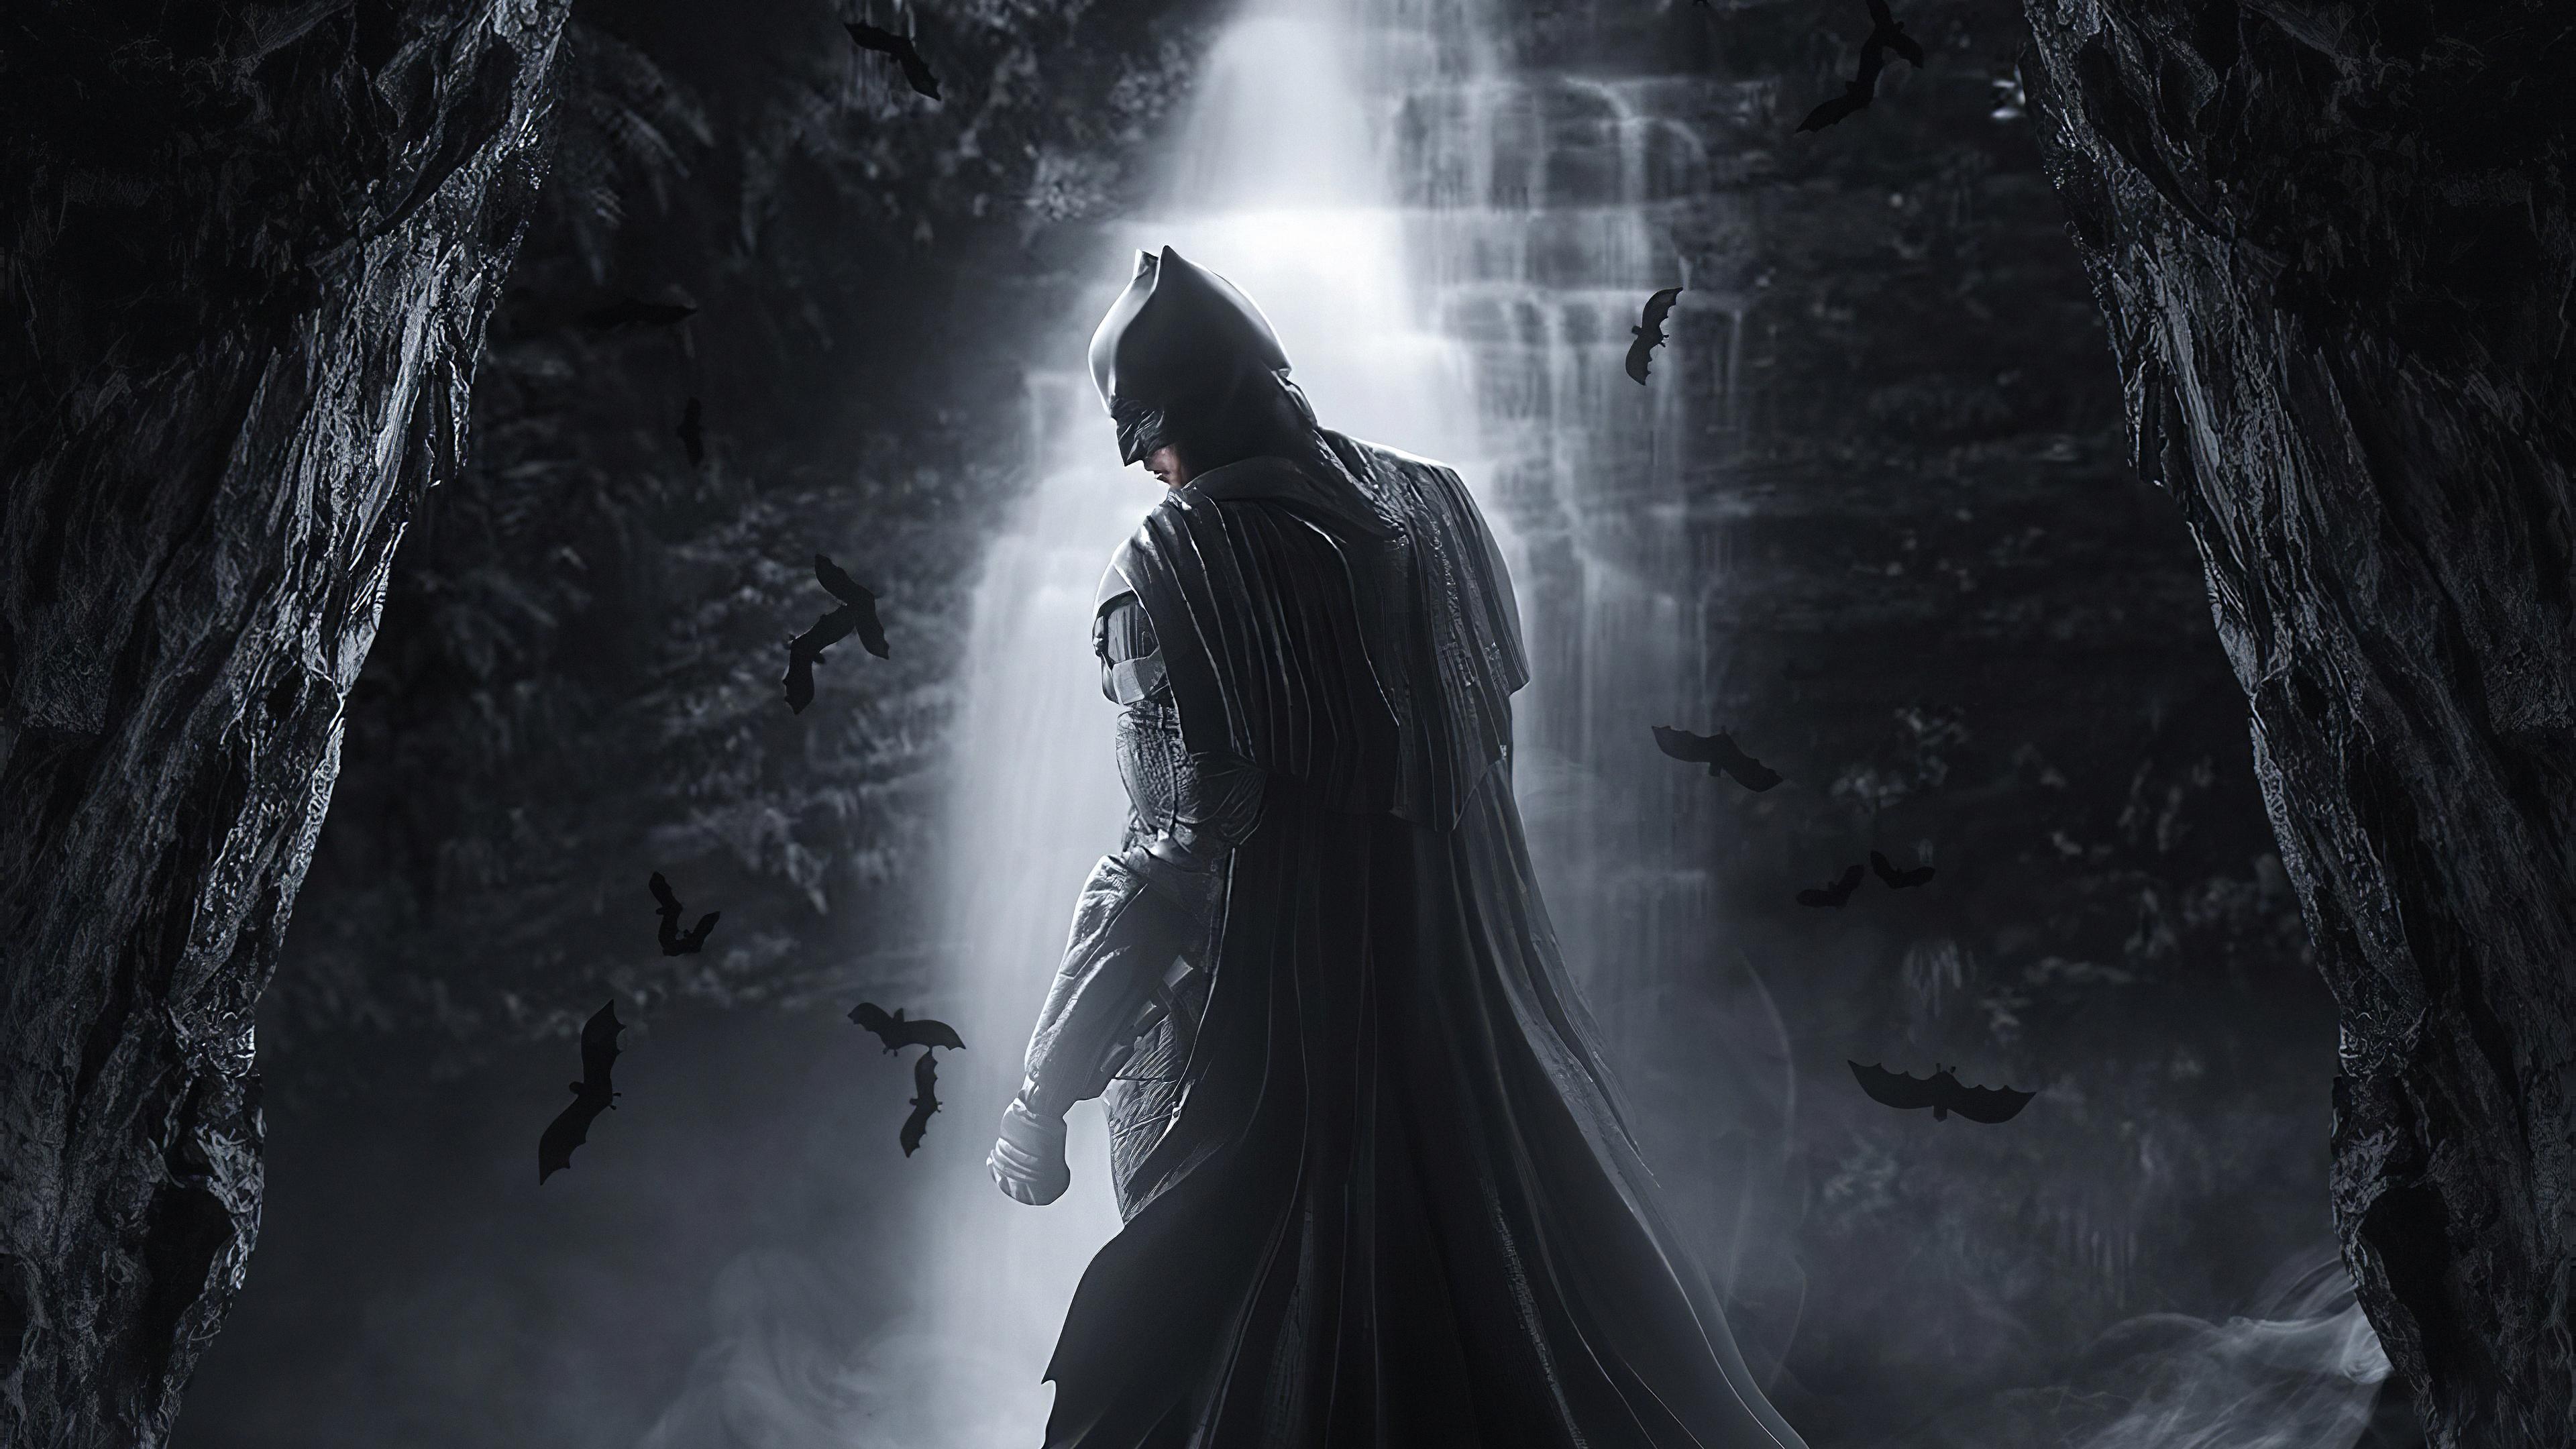 Wallpaper 4k Batman Dark Knight Art Batman 4k Wallpaper Batman